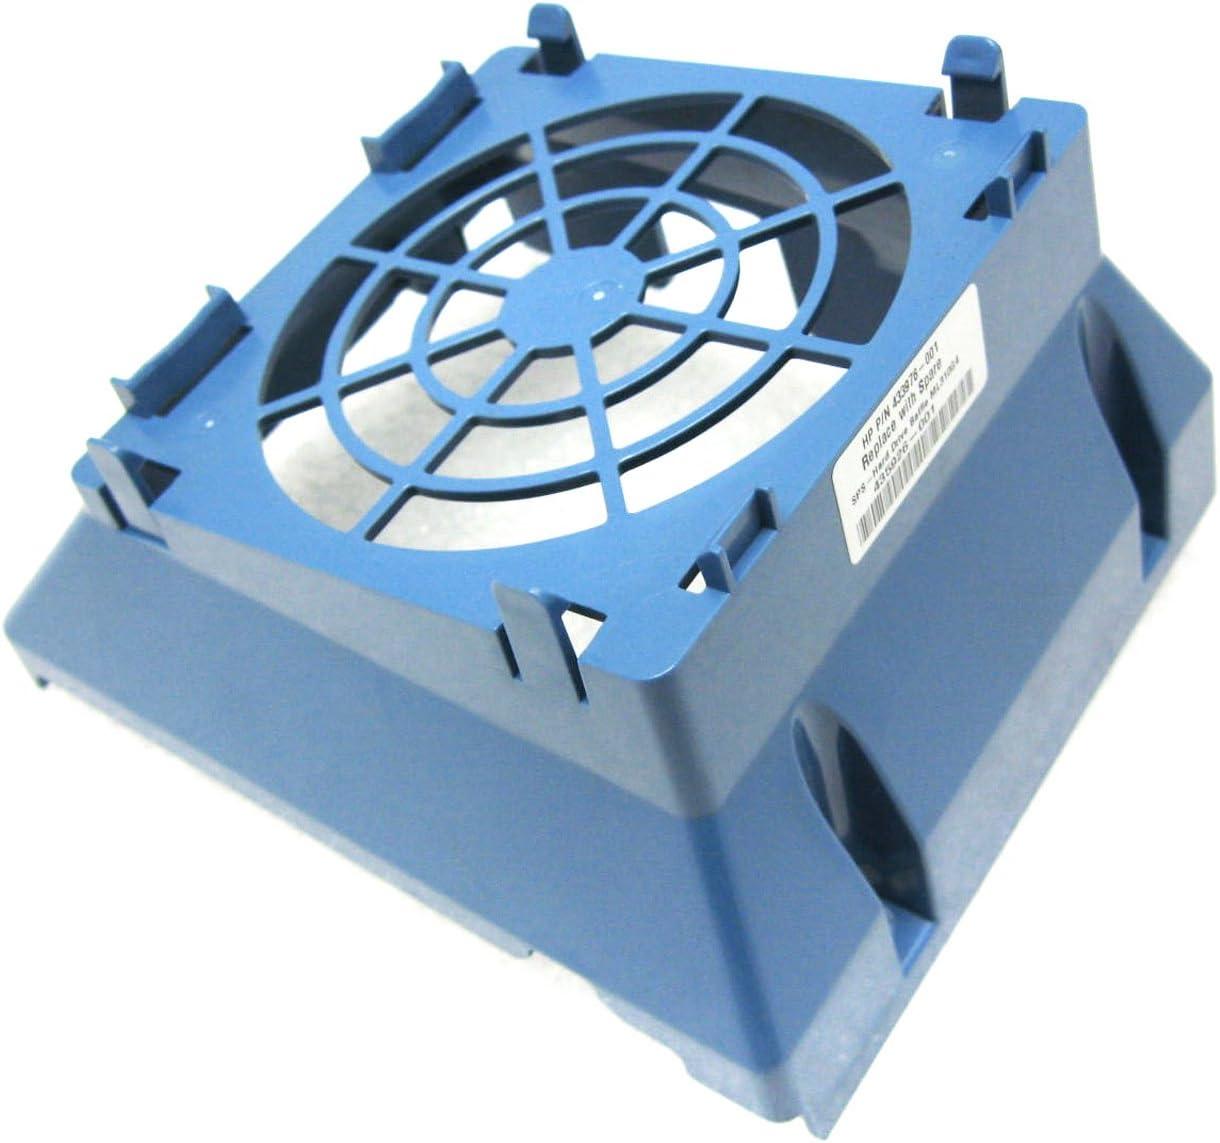 HP 435926-001 Hard drive cage fan baffle